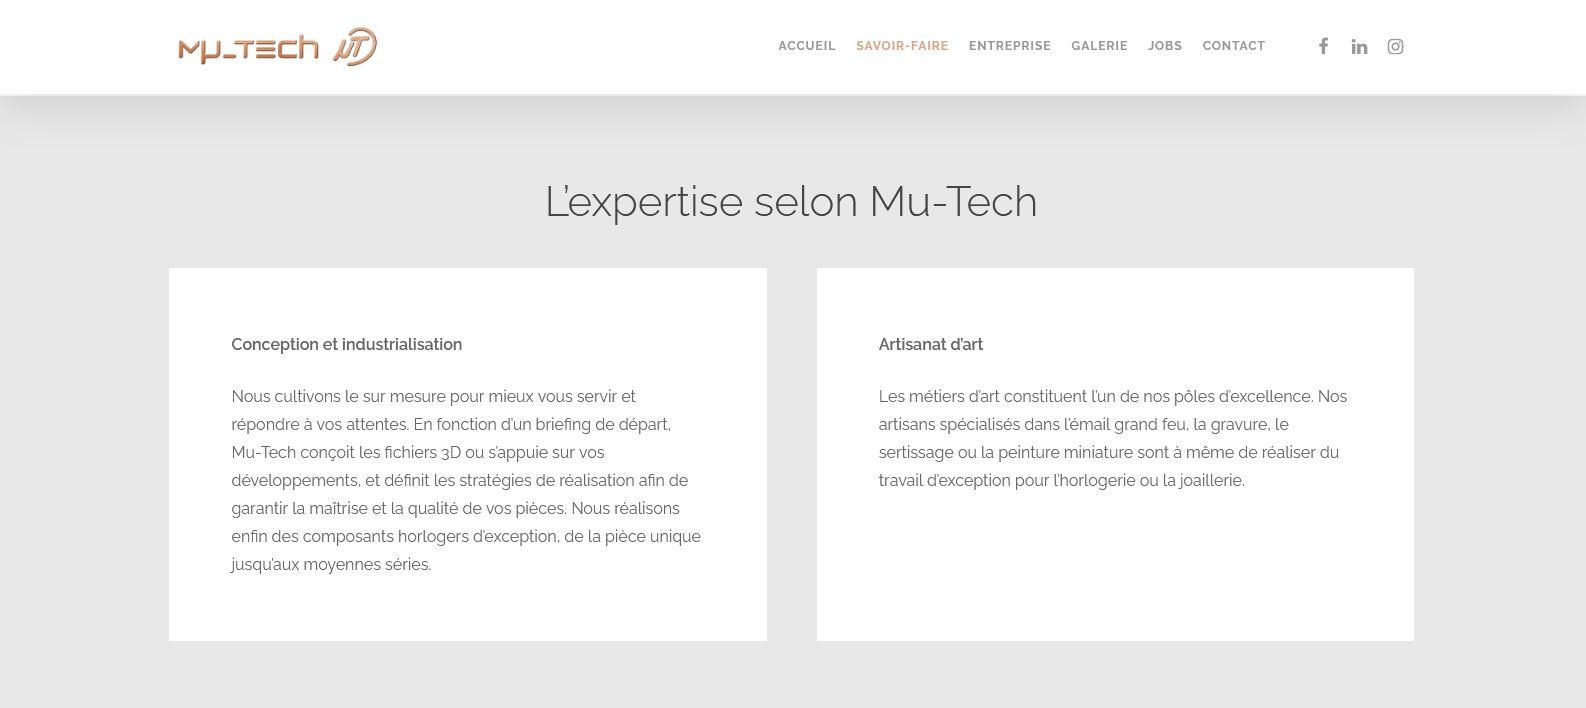 Horlogerie - Mu-Tech - Site internet - Page Expertise